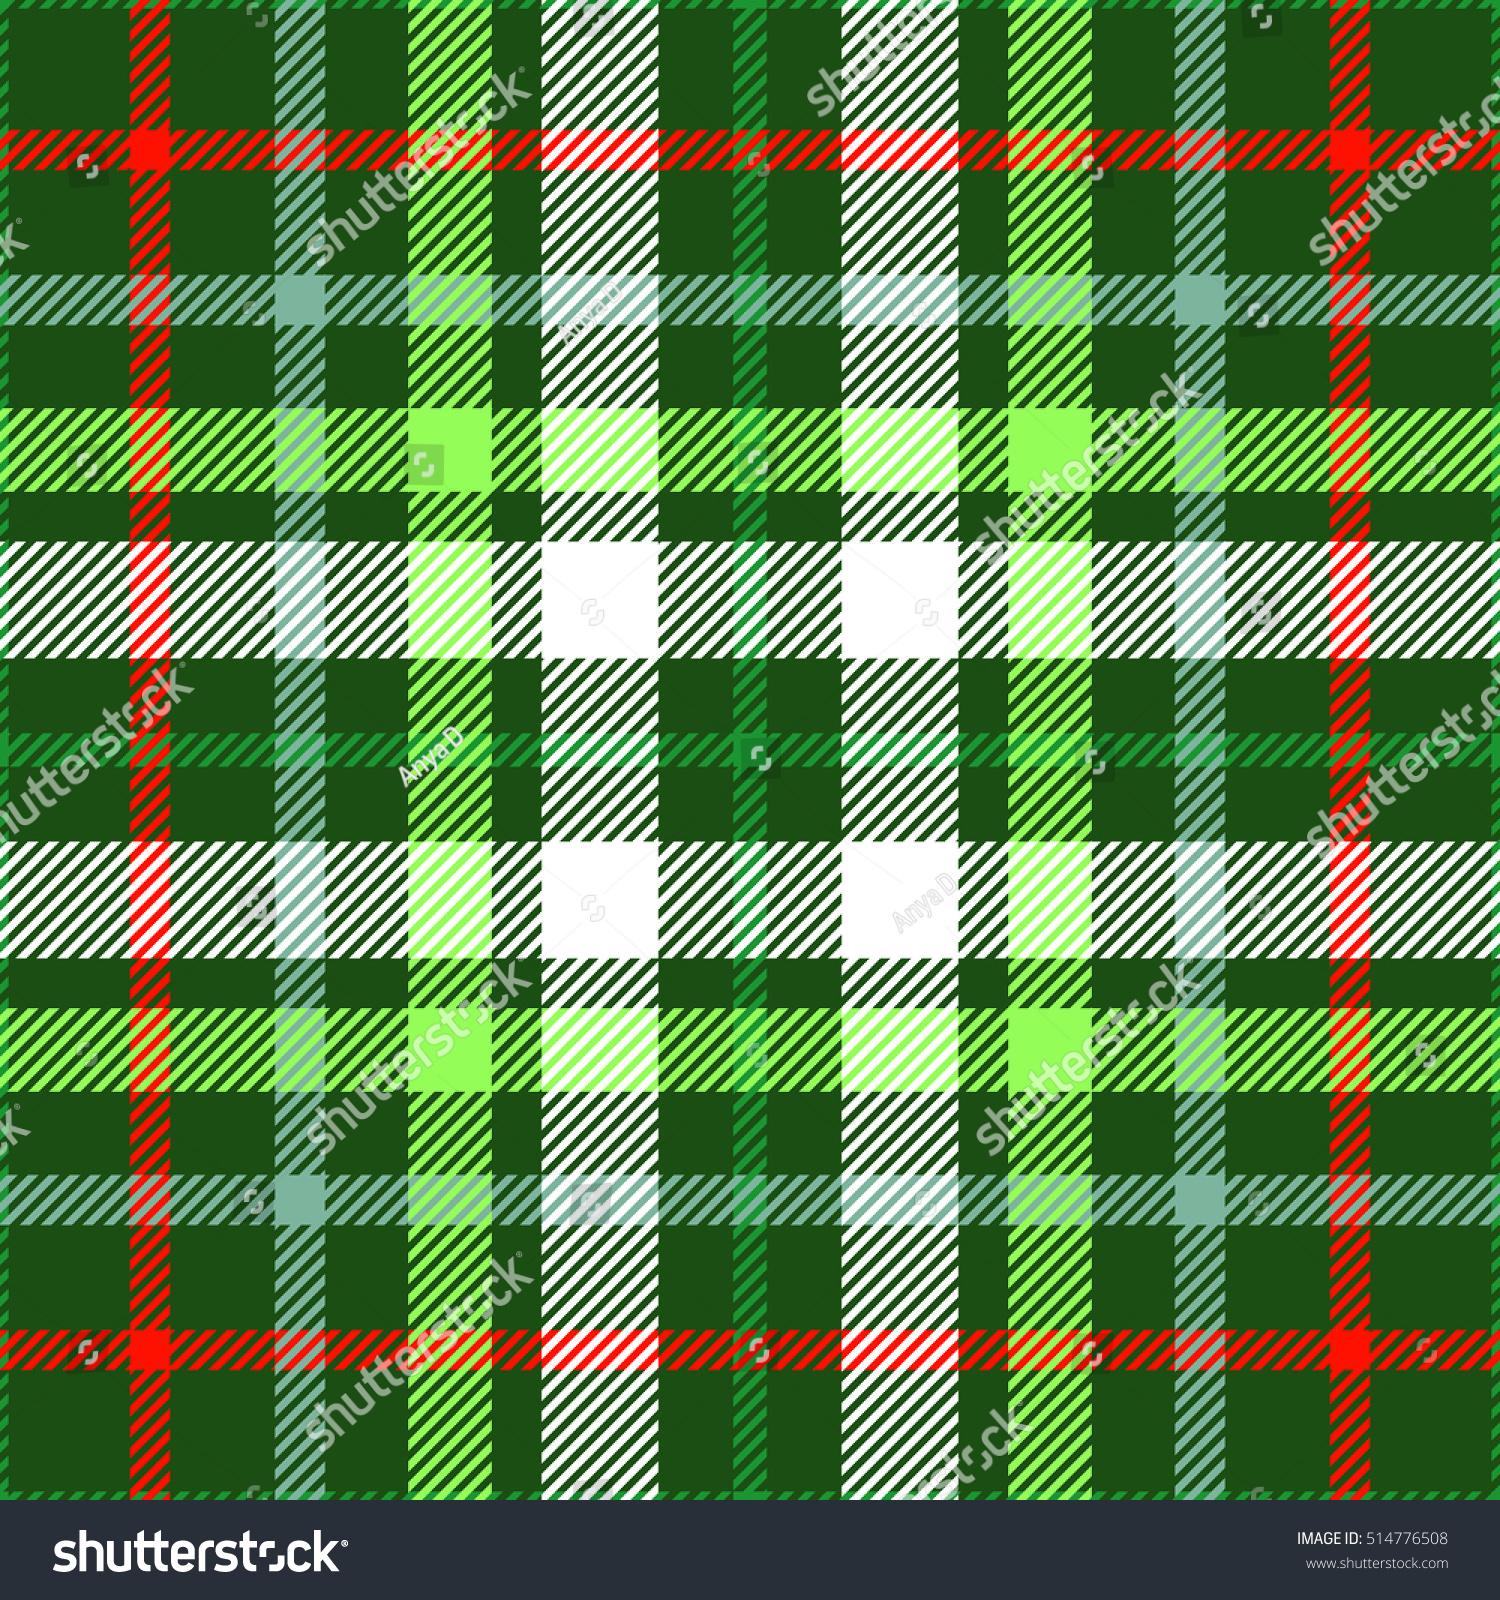 Tartan Plaid Seamless Tartan Plaid Pattern Christmas Color Stock Vector